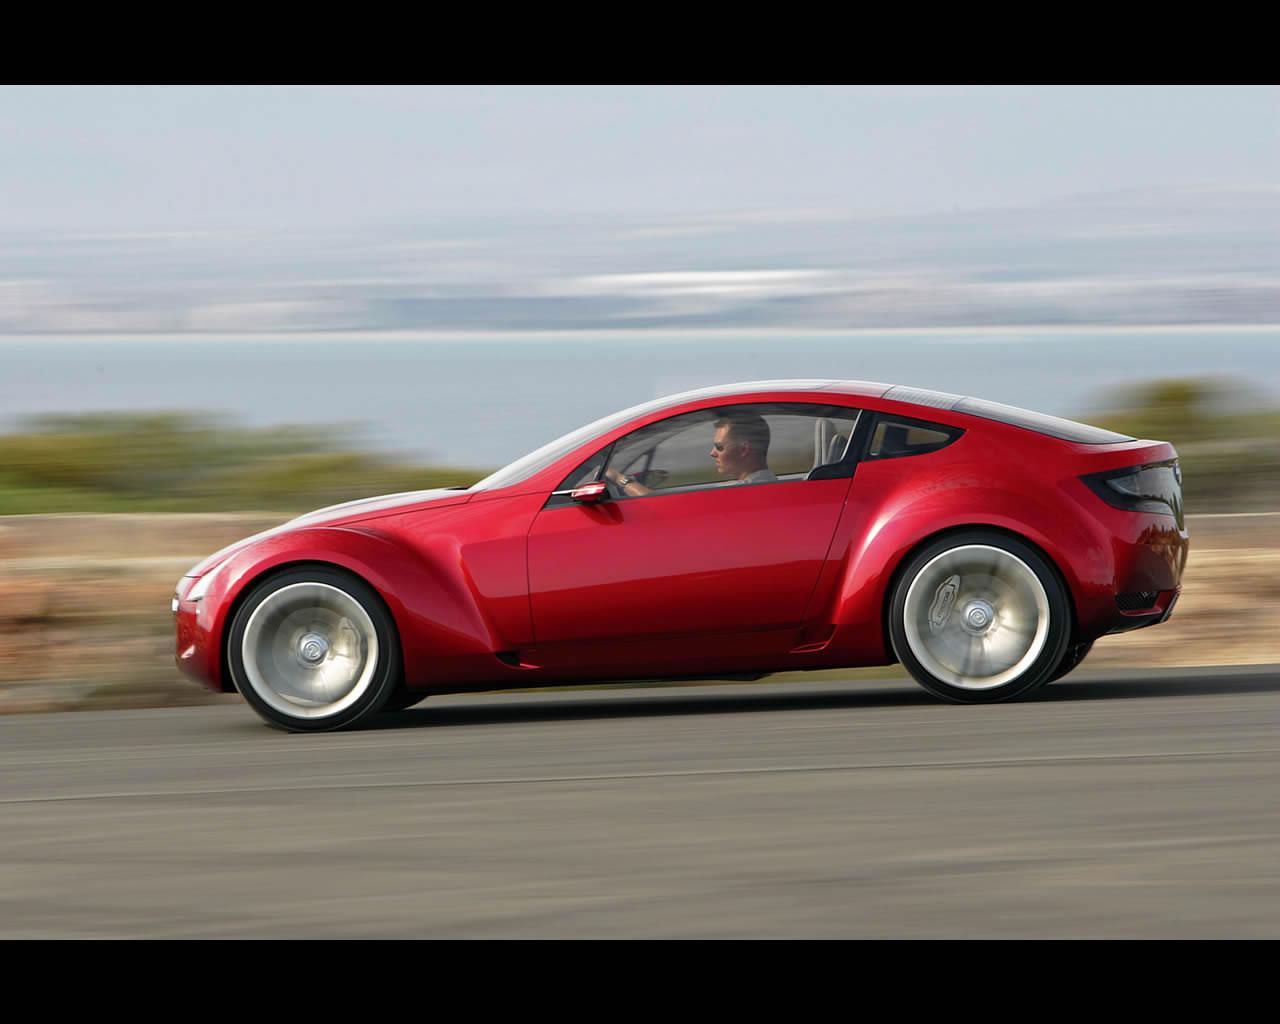 http://www.autoconcept-reviews.com/cars_reviews/mazda/mazda-kabura/wallpaper/Mazda_Kabura_2006_driving04_print.jpg